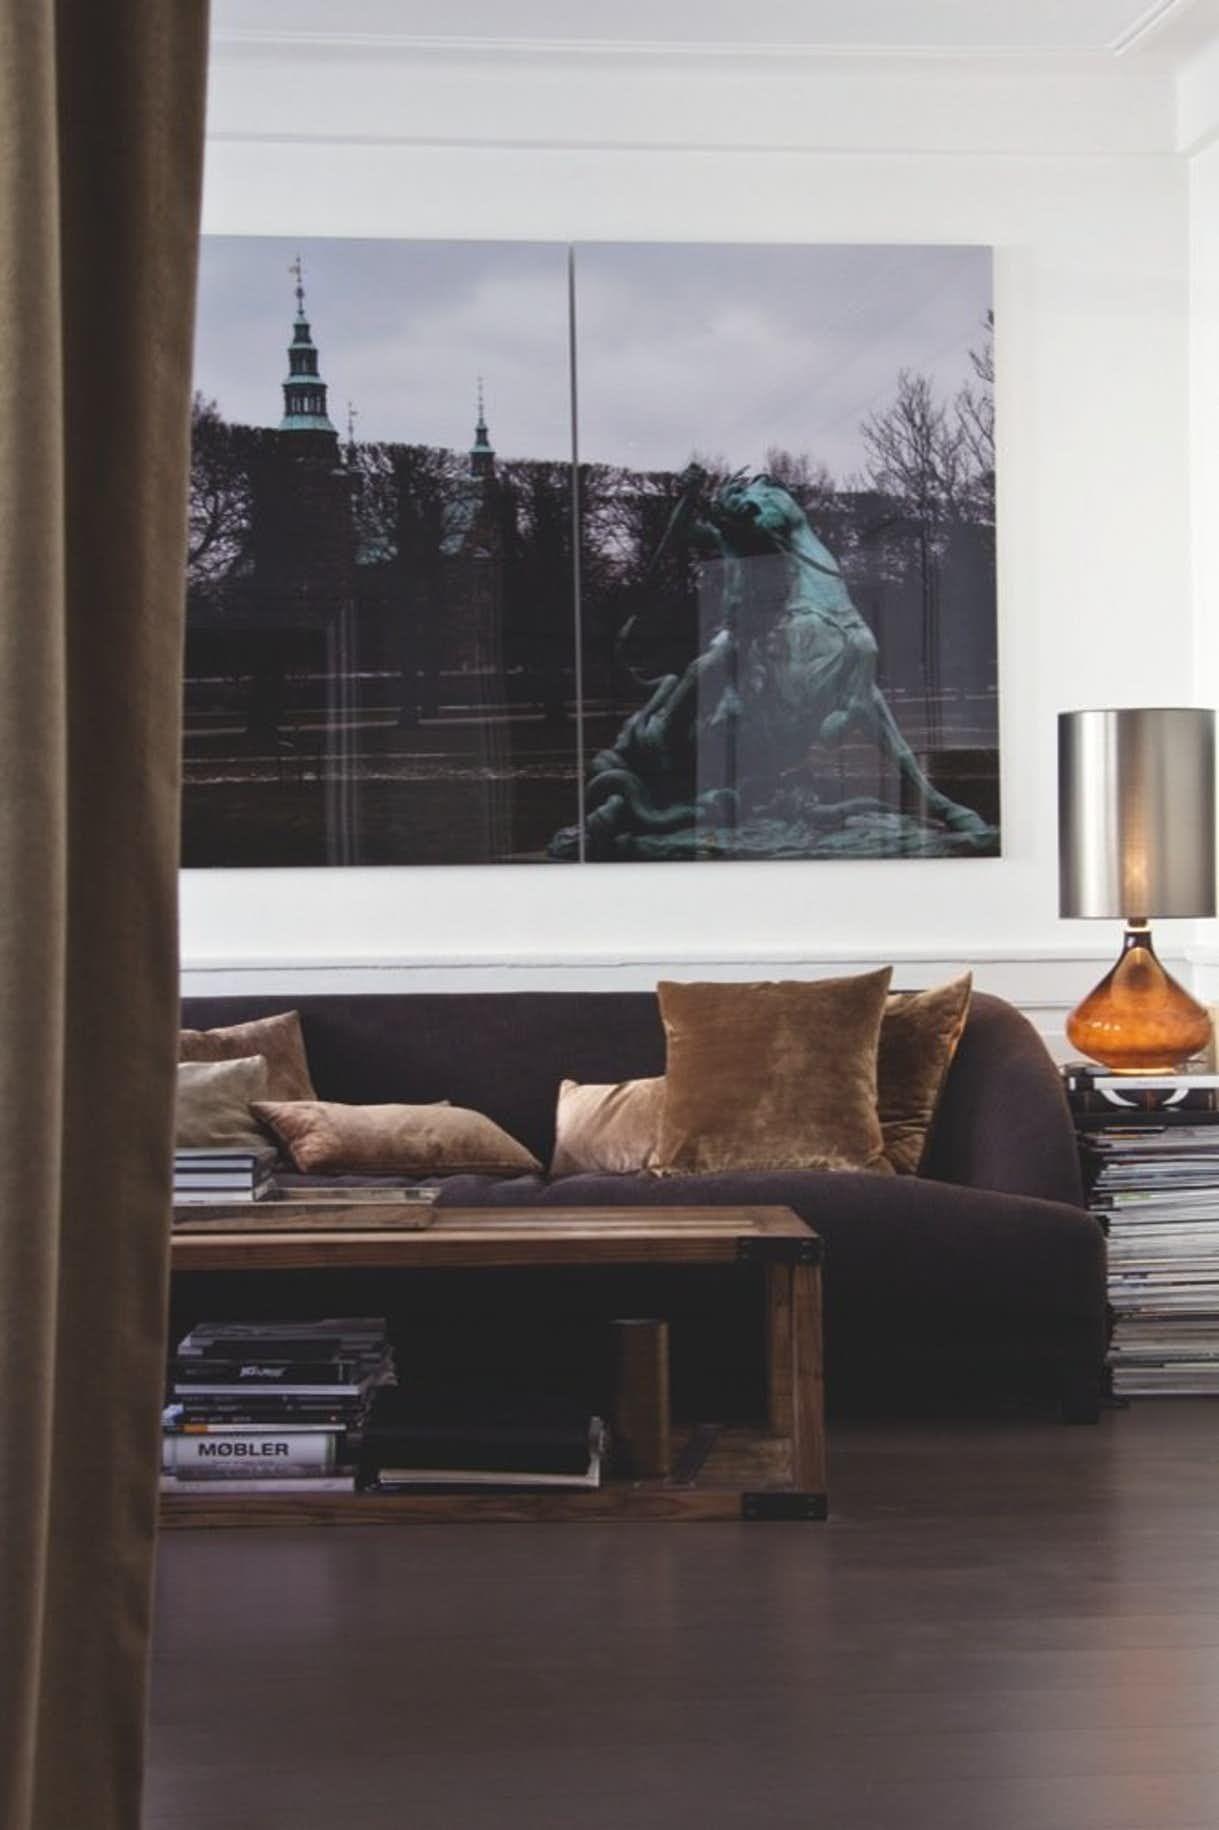 Dekadent ungkarlehybel | Interiørarkitektur, Husdesign, Vægge